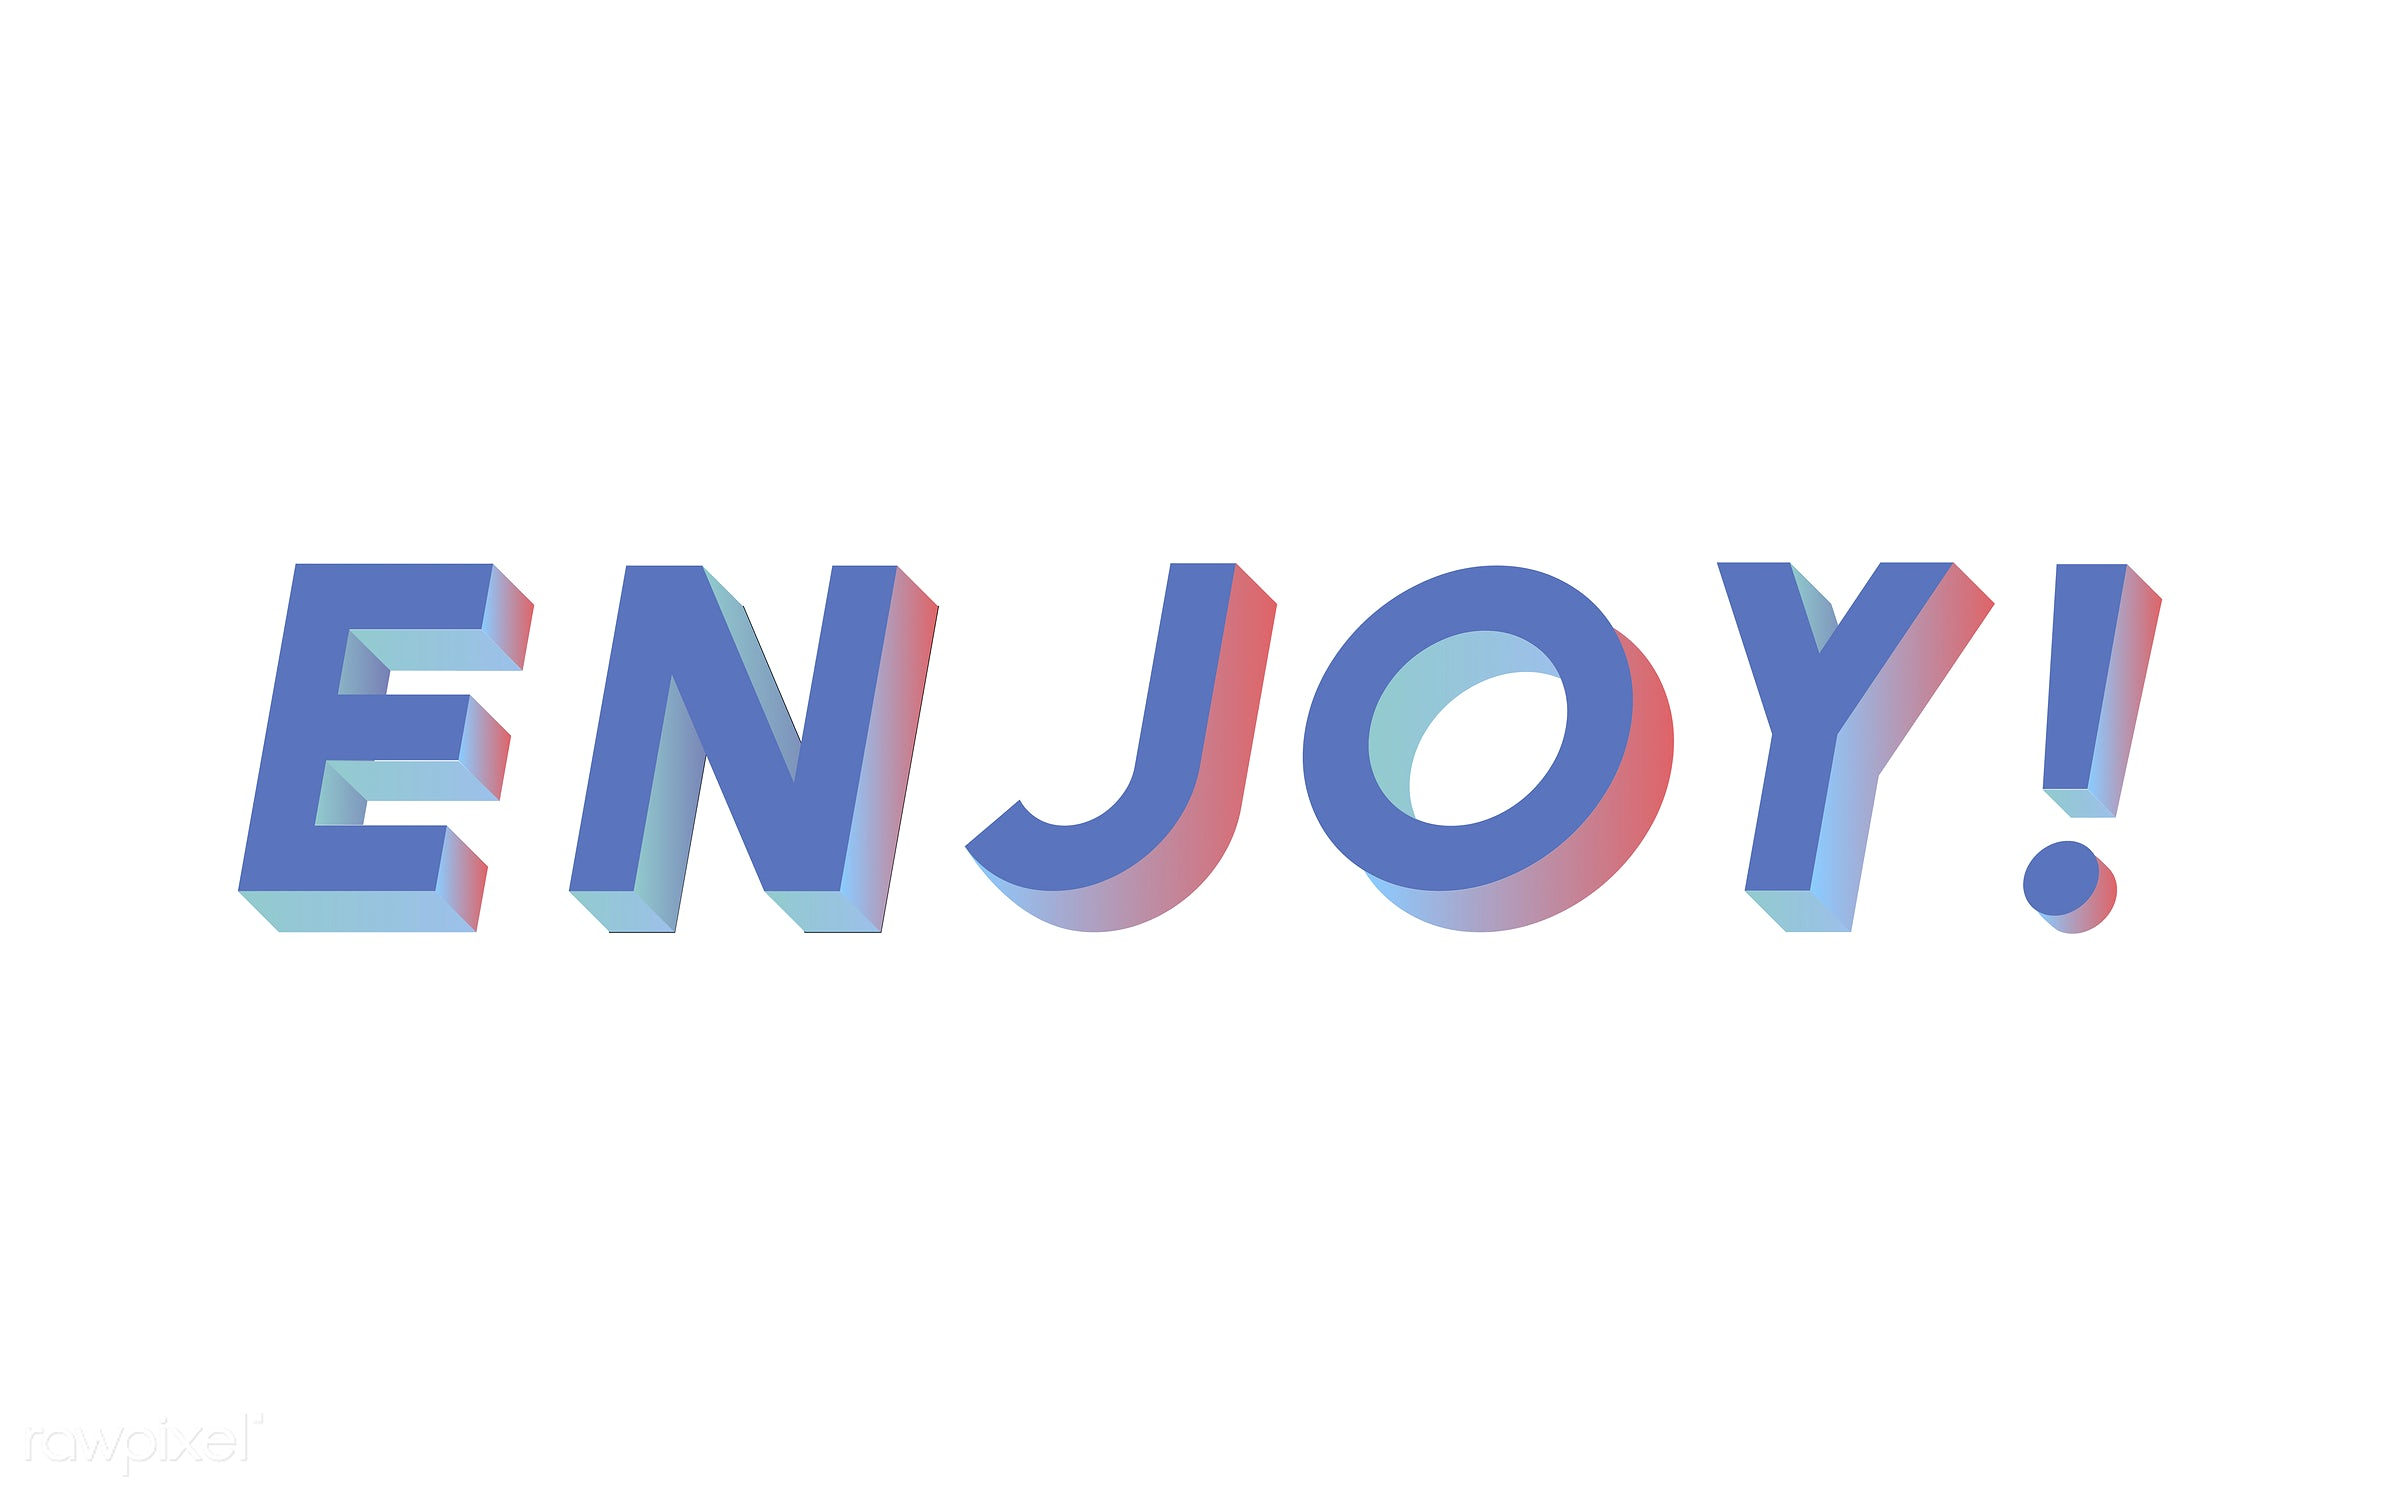 neon, colorful, 3d, three dimensional, vector, illustration, graphic, word, white, blue, enjoy, enjoyment, joy